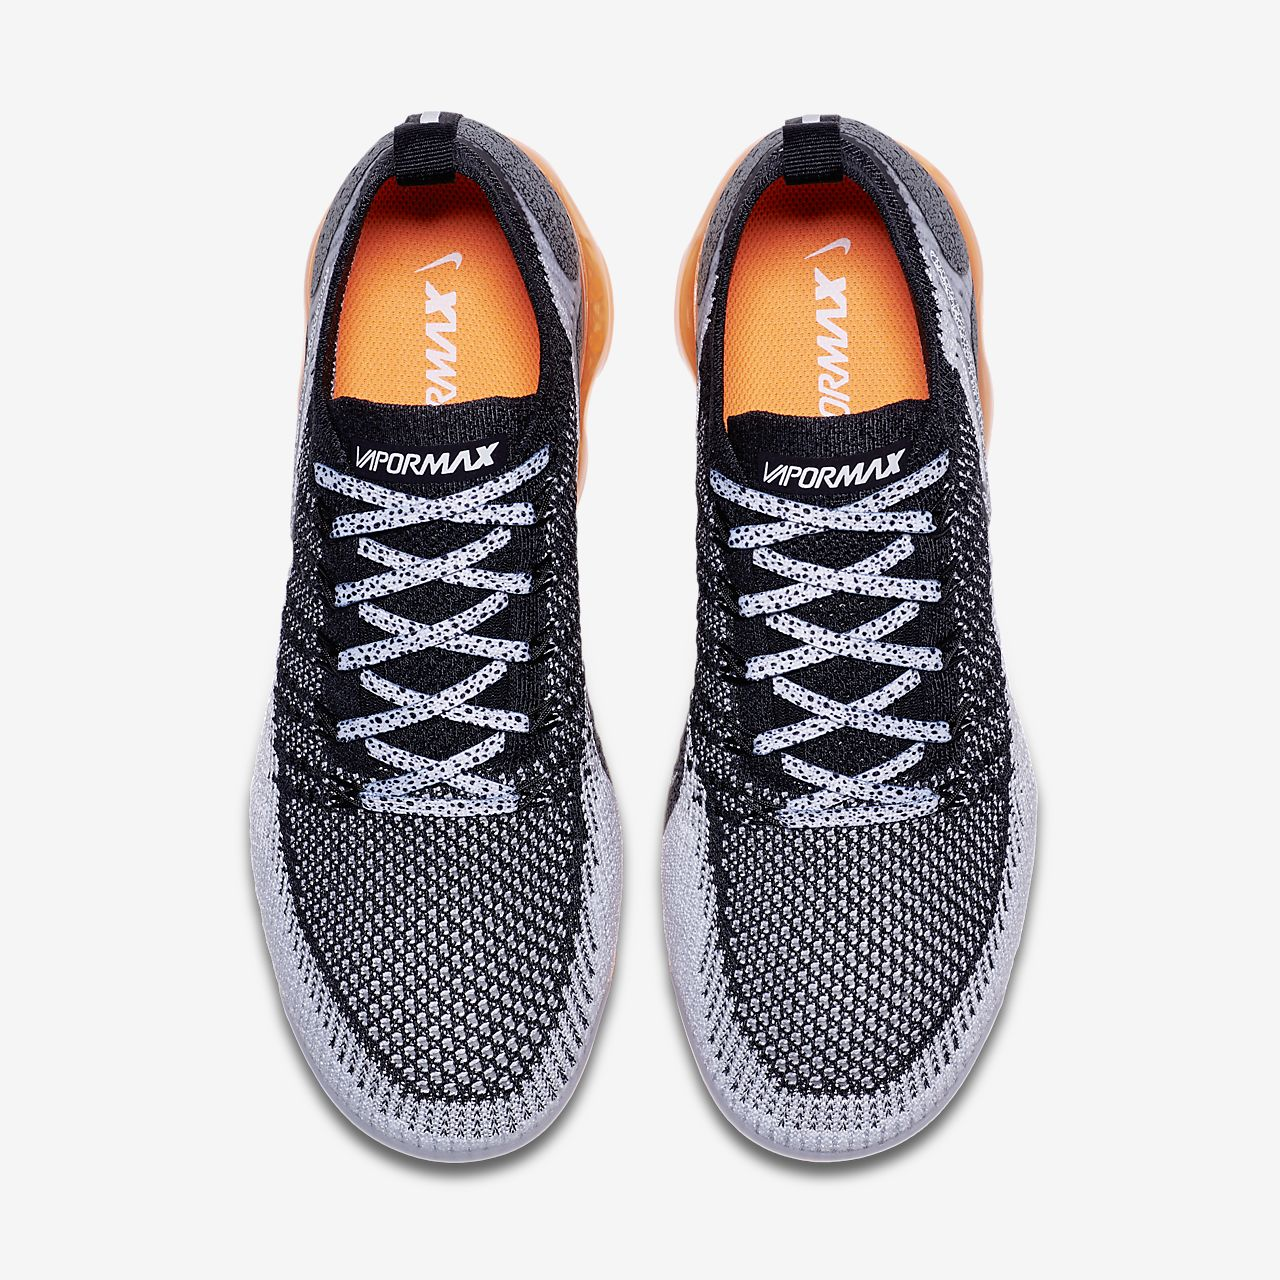 e2feb0e9af3e Nike Air VaporMax Flyknit 2 Safari Shoe. Nike.com GB